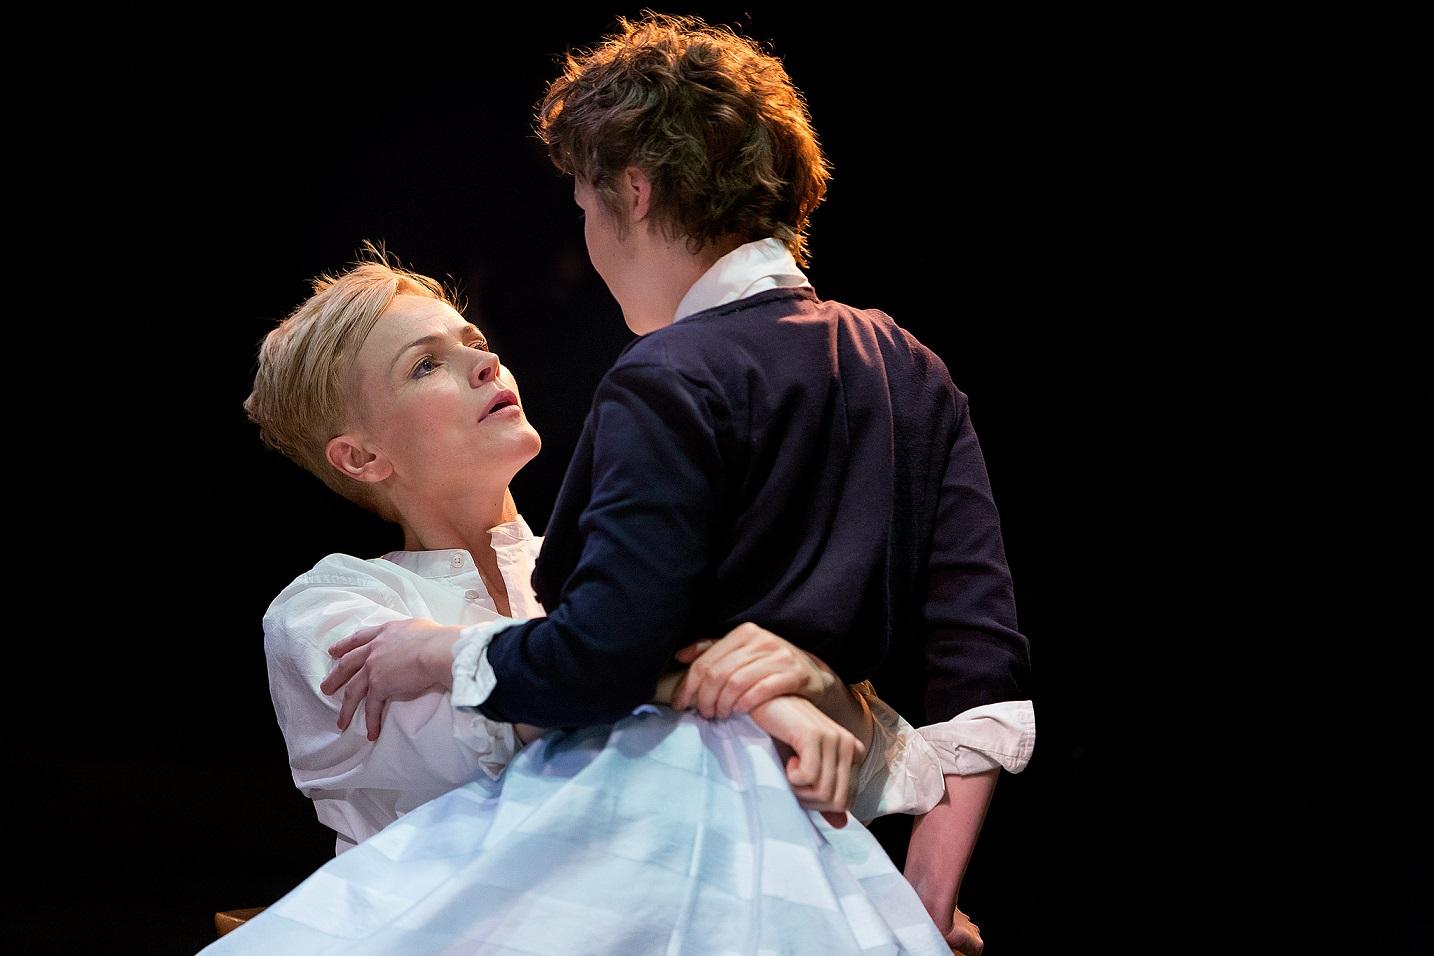 Hamlet s attitude and treatment of women